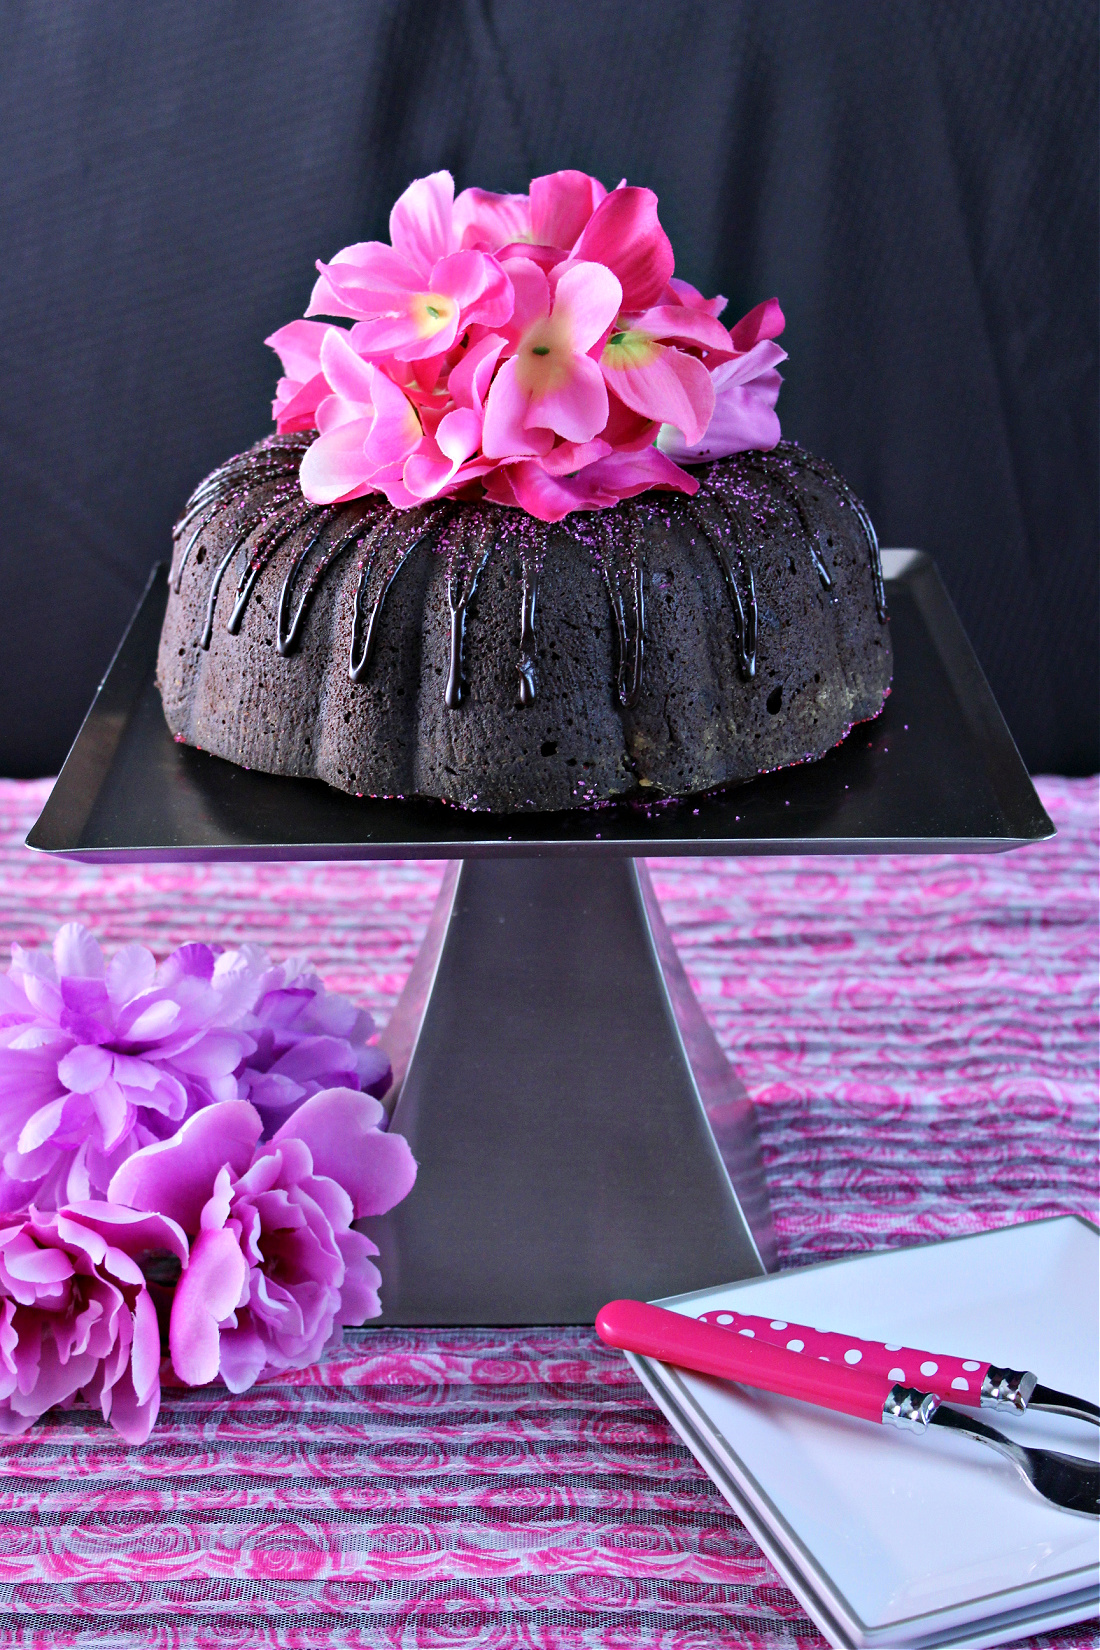 Super Moist Chocolate Bundt® Cake